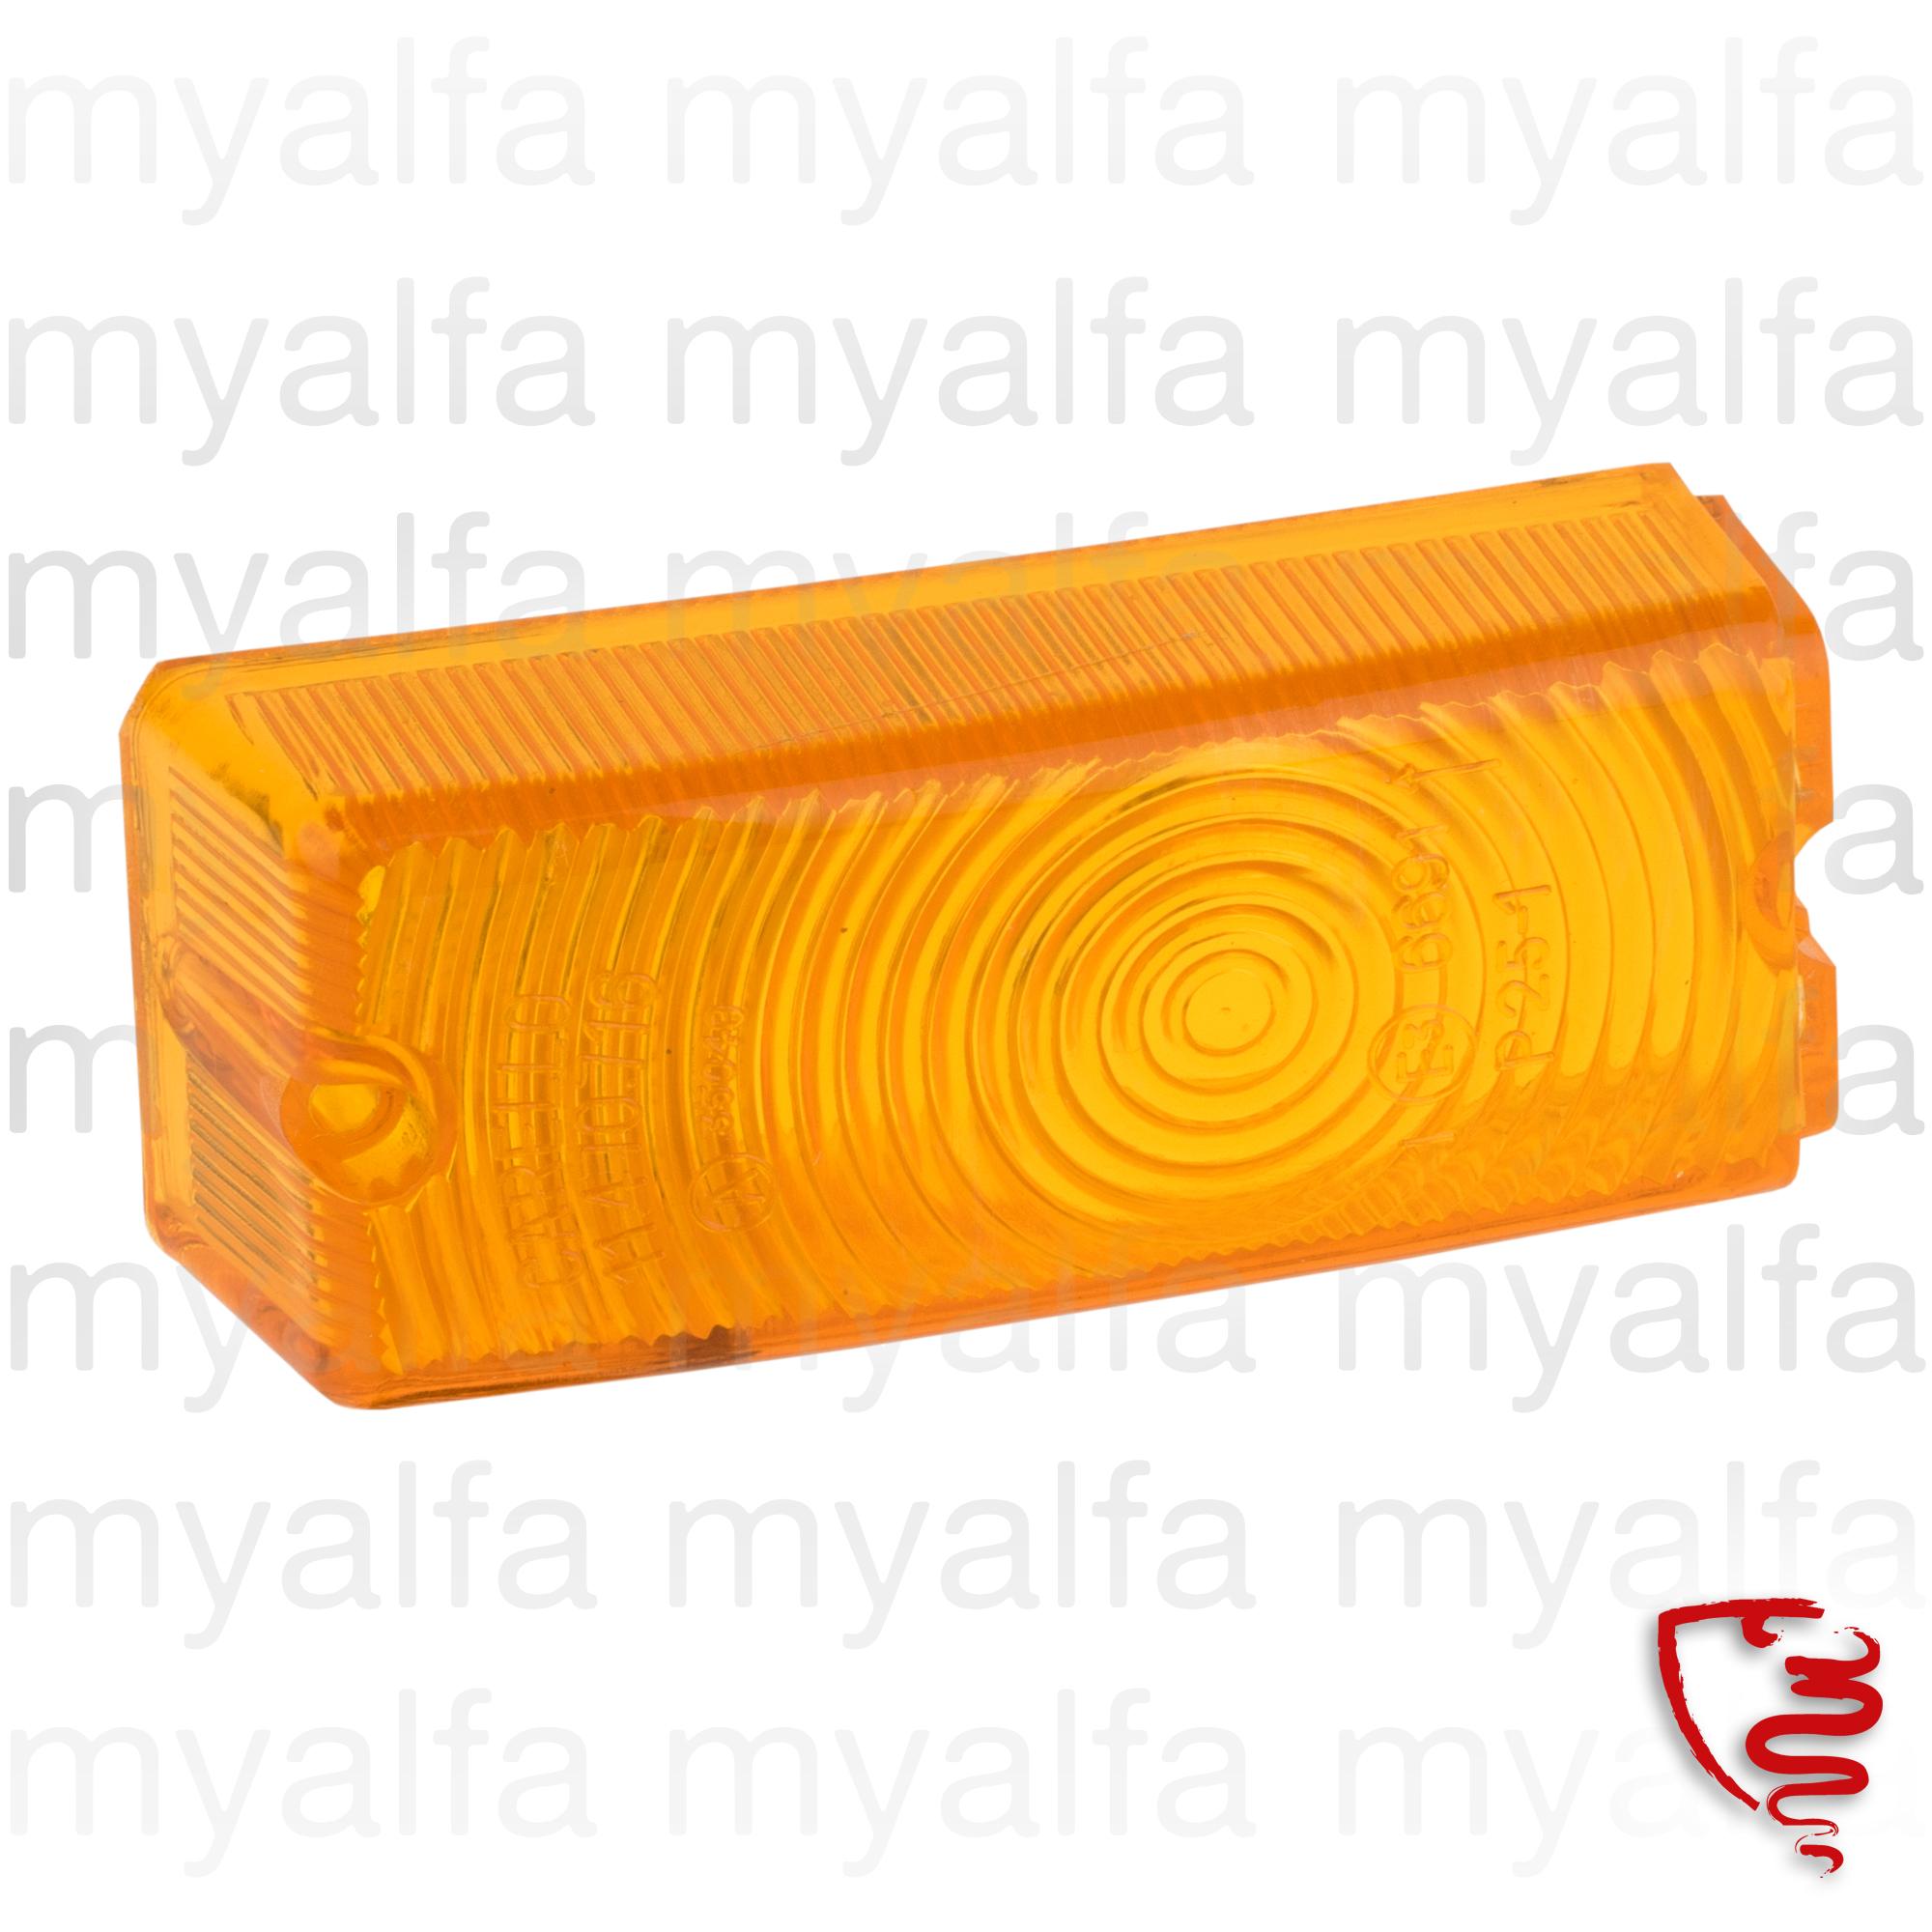 Lens flashes w / orange 1962-73 dividing Carello Giulia for 105/115, Giulia, Body parts, Lighting, Indicators